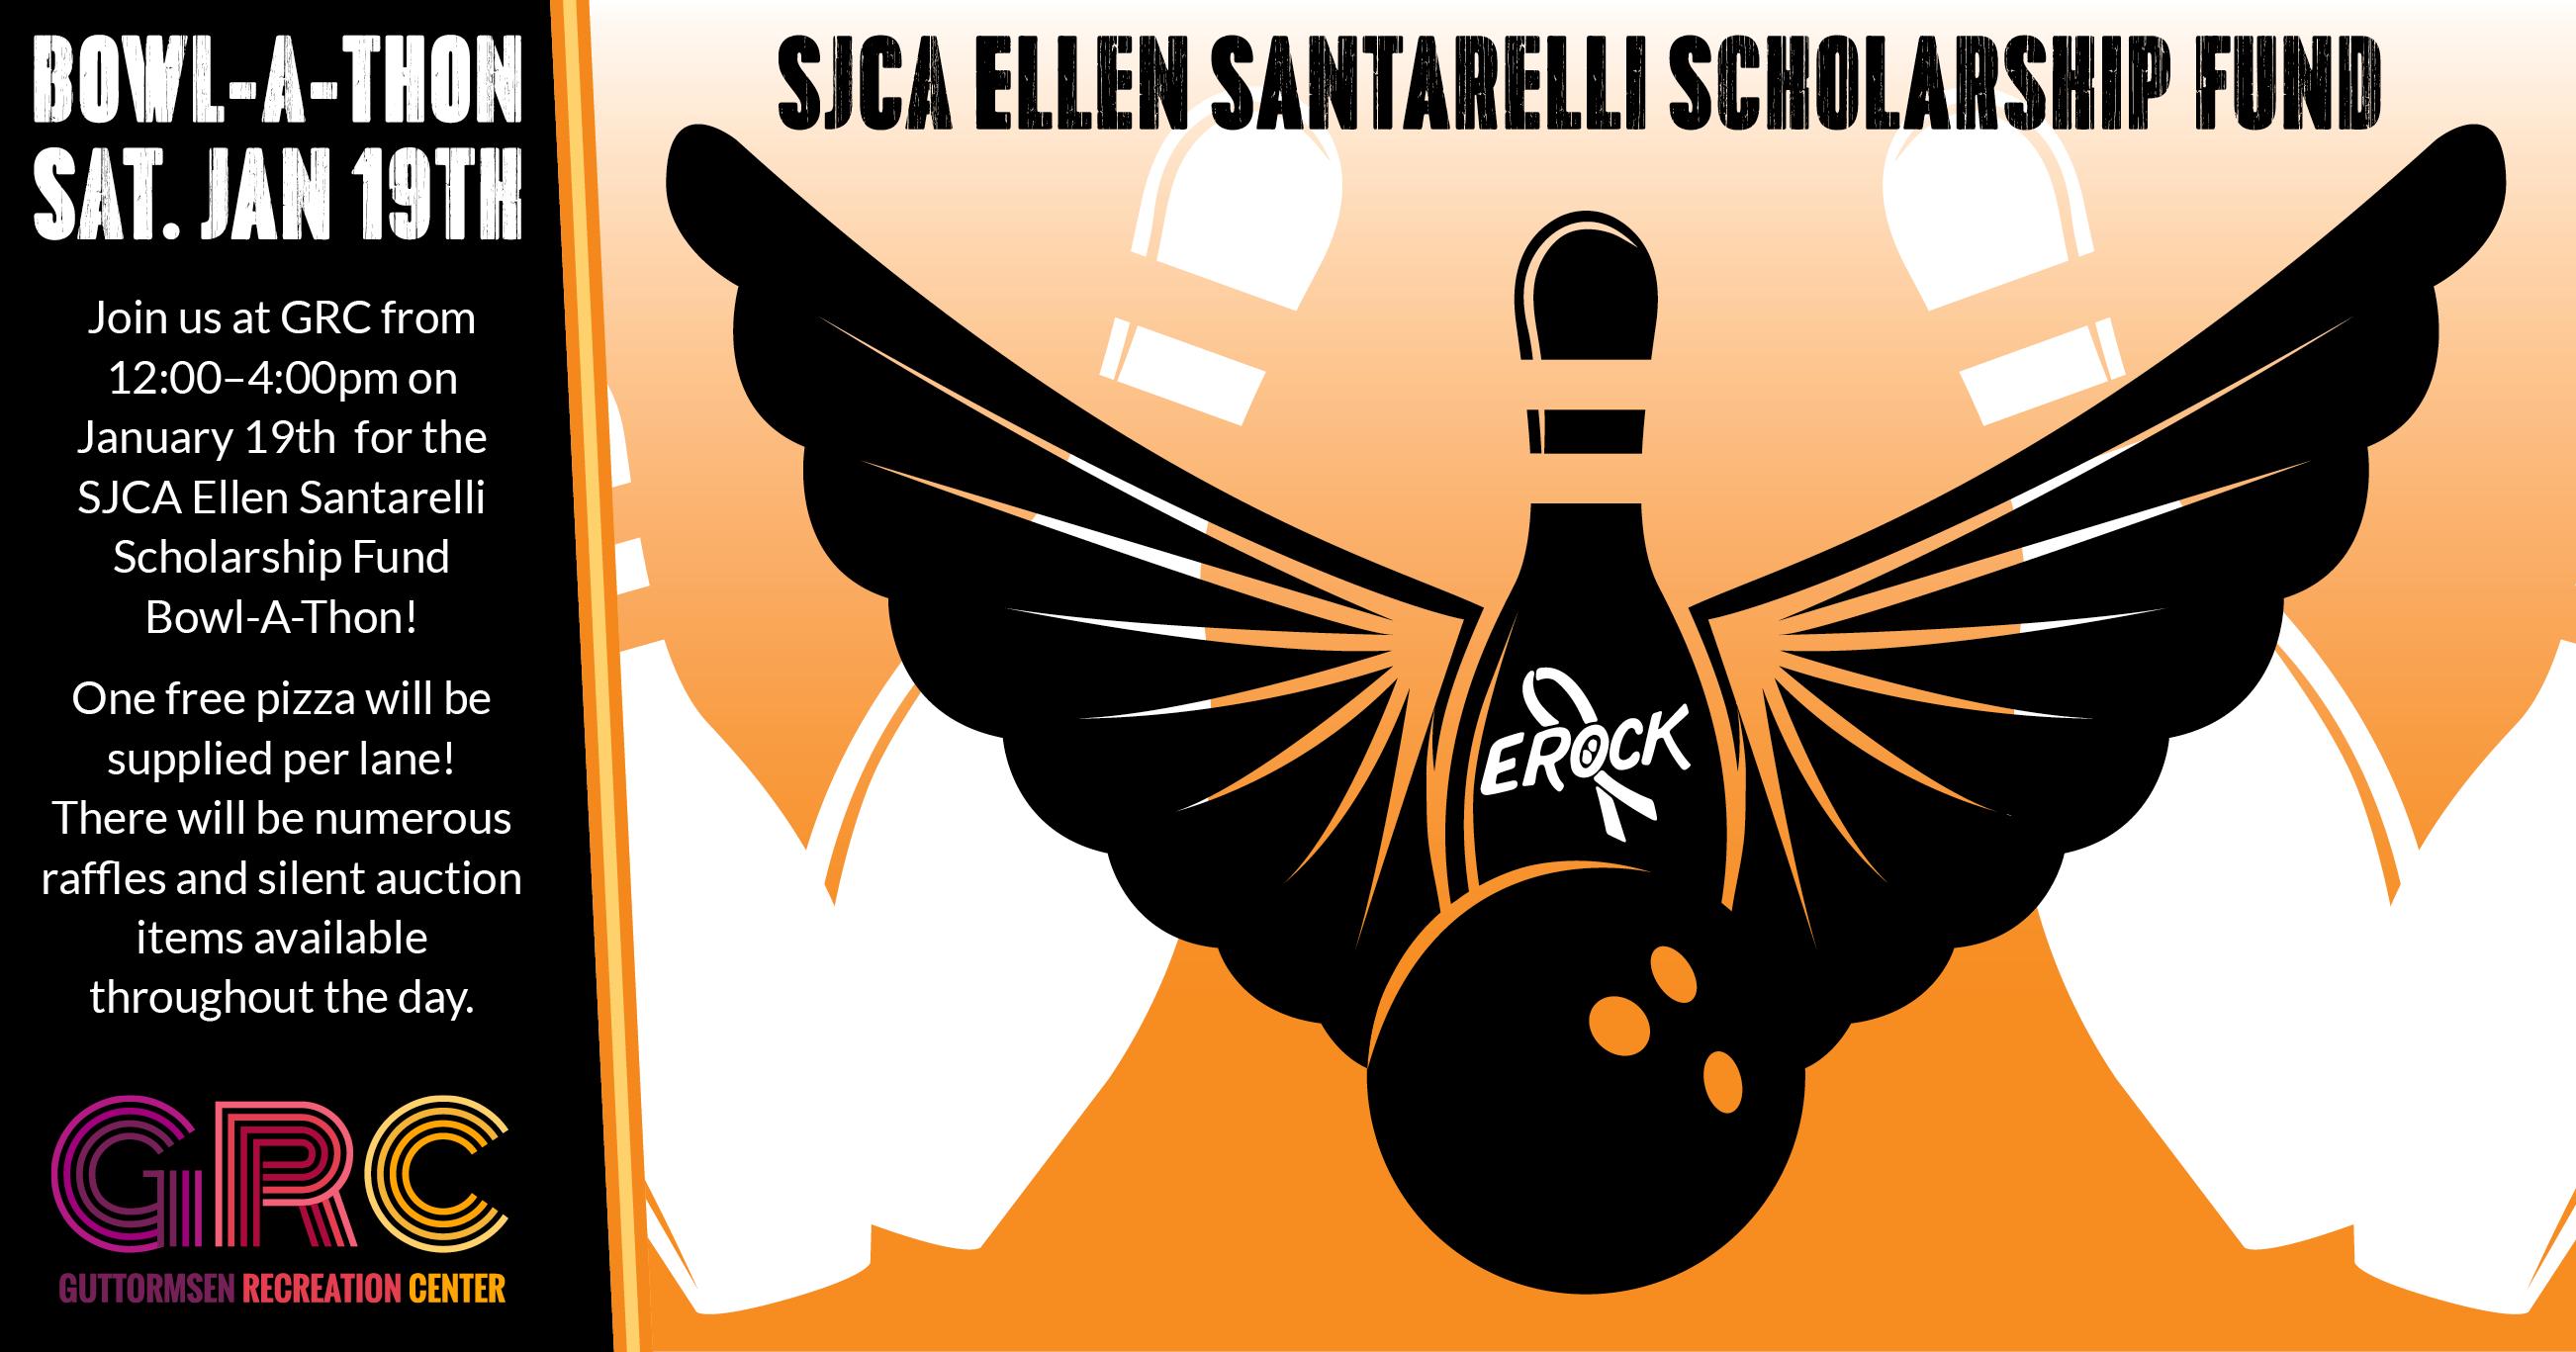 SJCA Ellen Santarelli Scholarship Fund Bowl-A-Thon